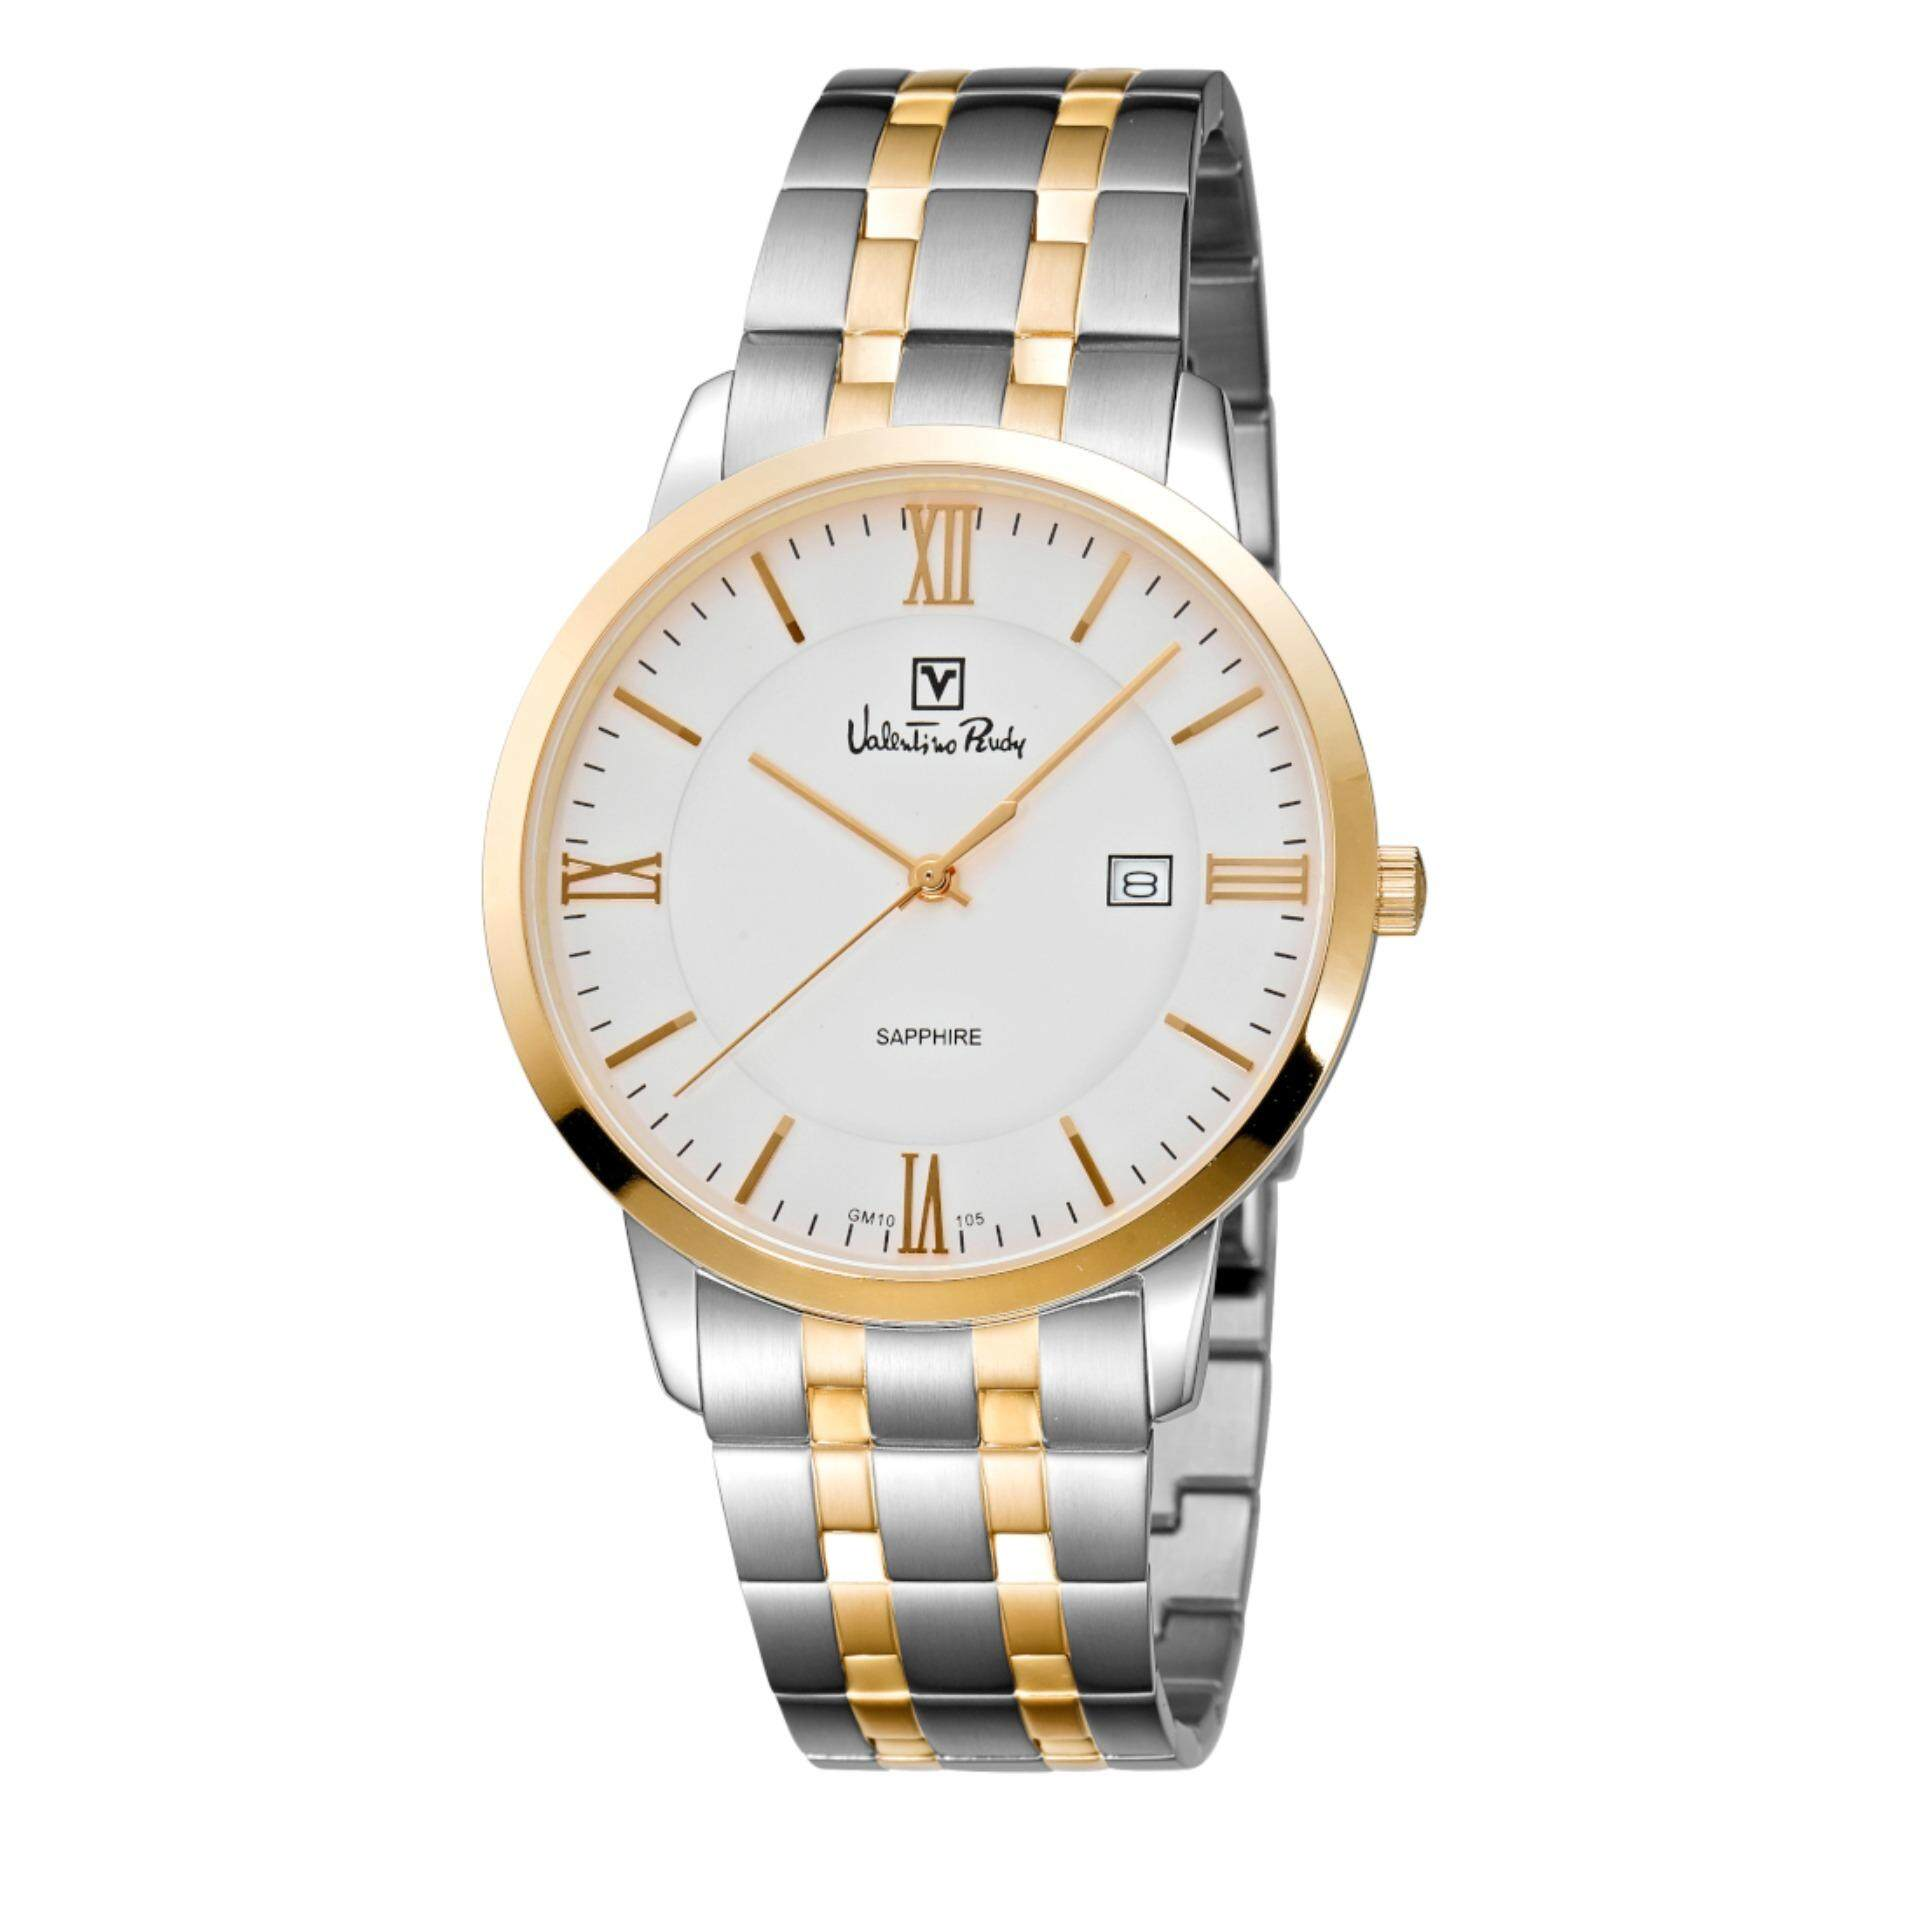 Valentino Rudy Men Watch Jam Tangan Lelaki VR105-1113 Silver Stainless Steel Watch Malaysia